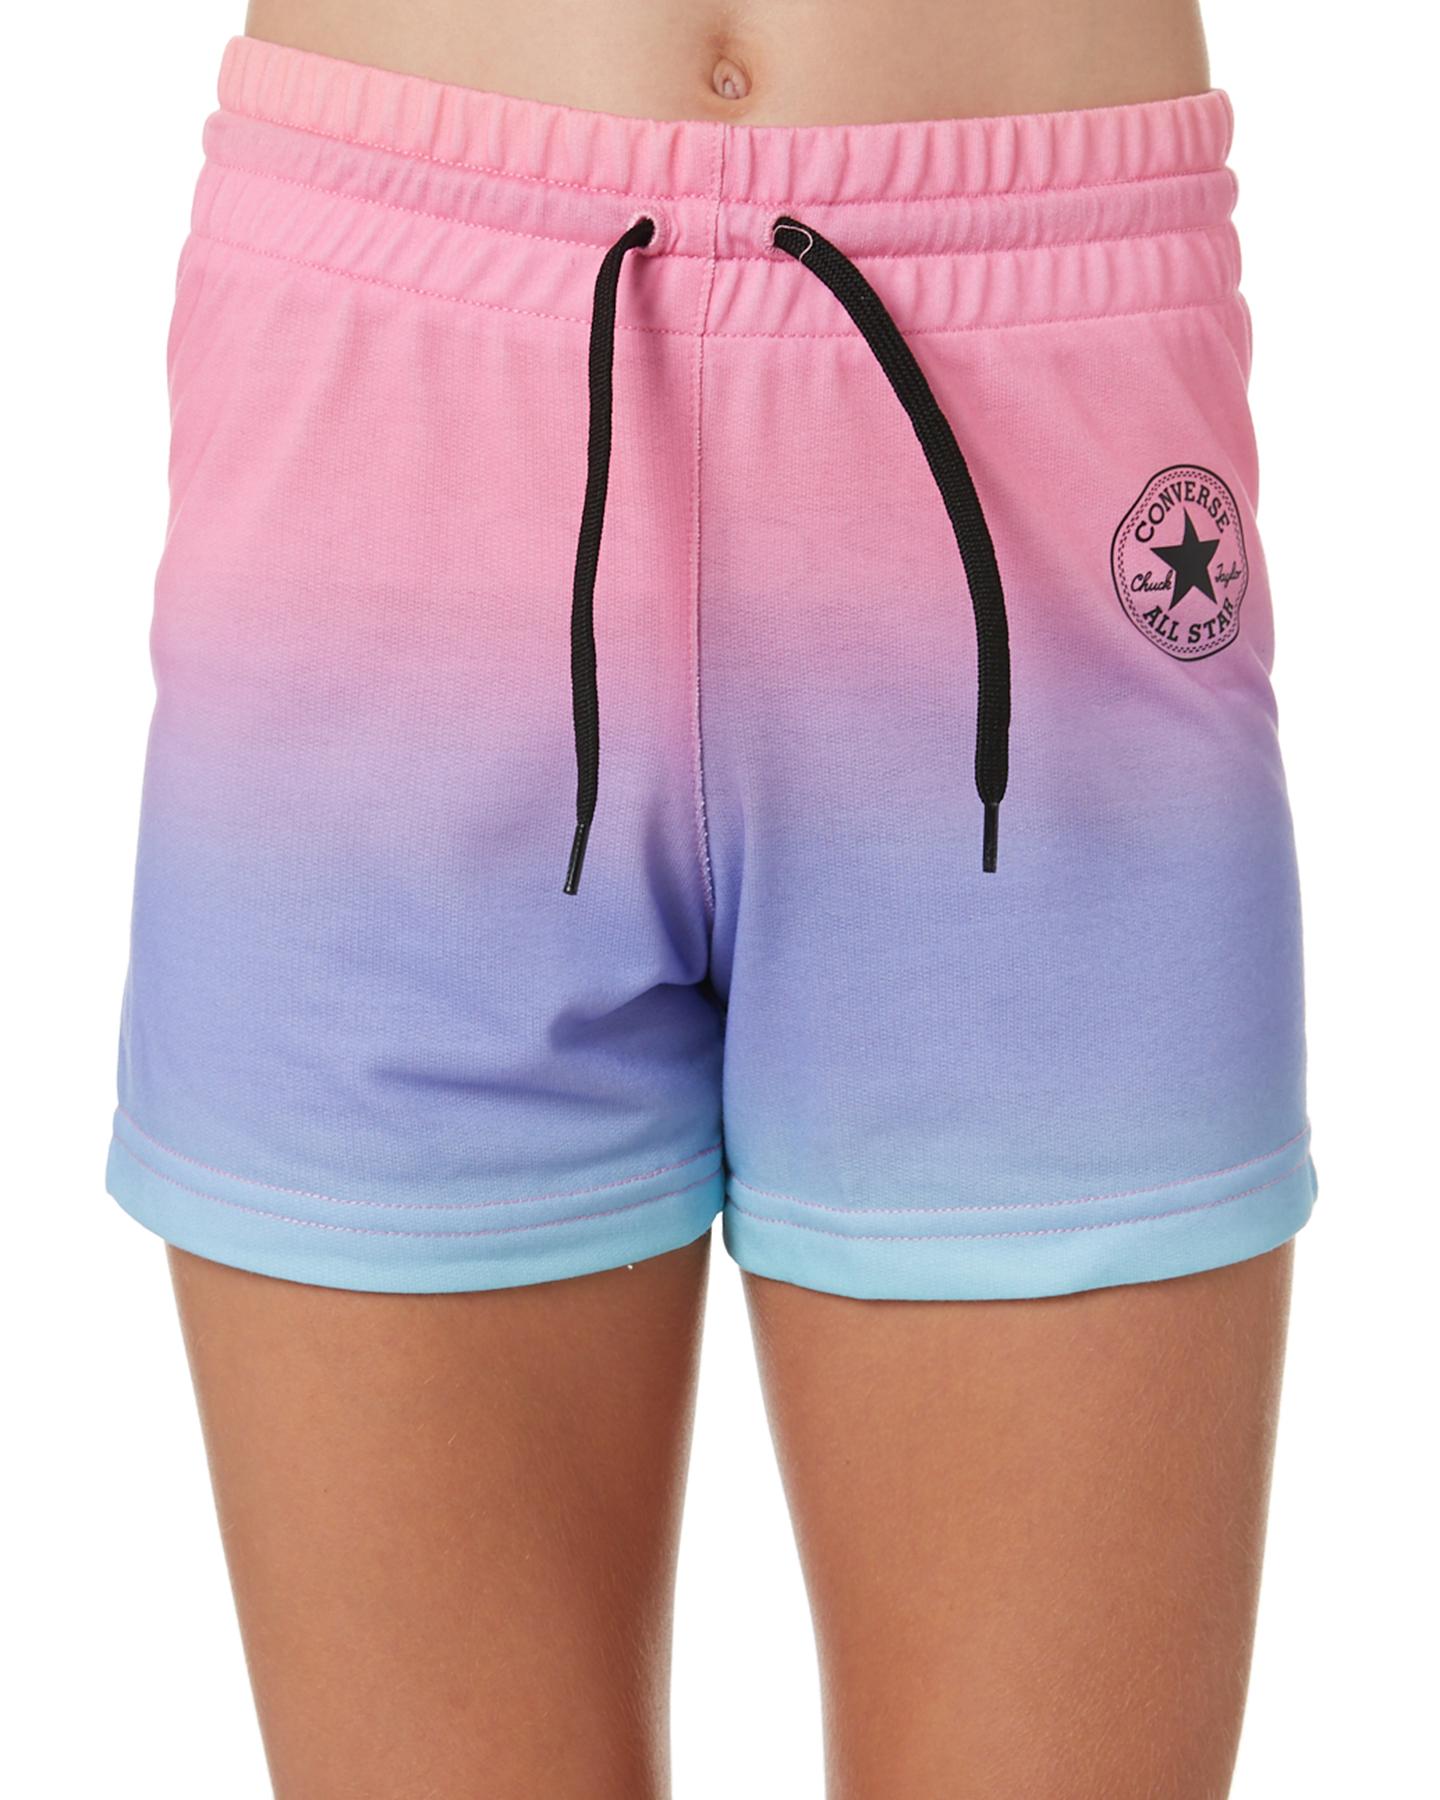 Converse Girls Super Soft Ombre Shorts - Teens White Gradient Black